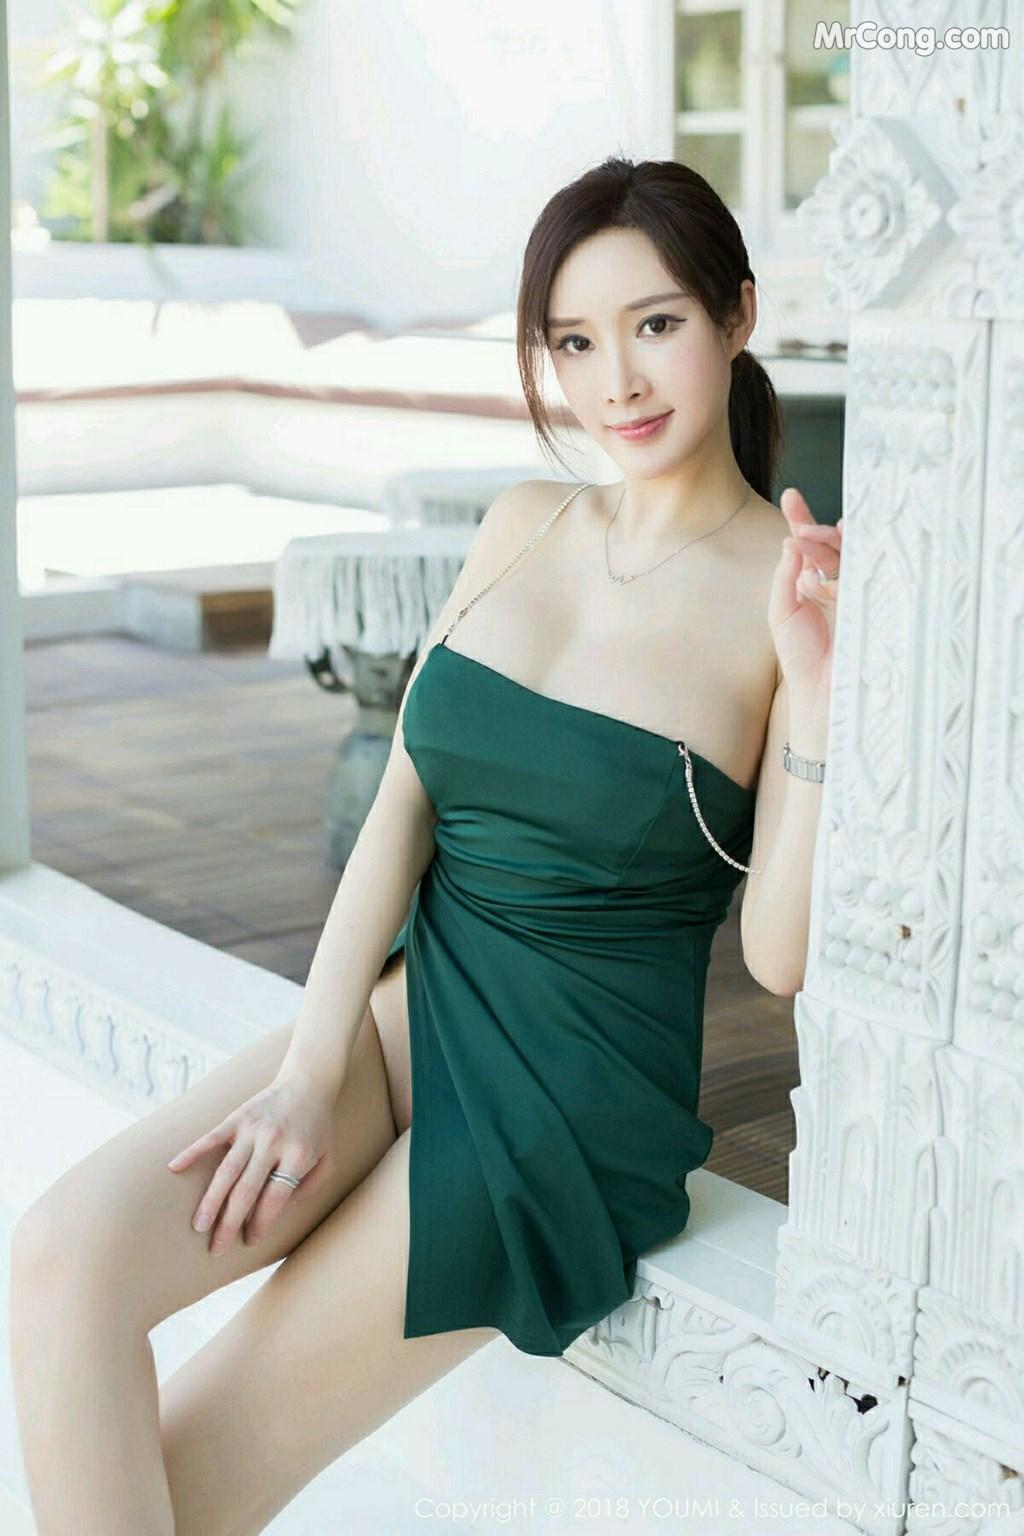 Image YouMi-Vol.188-Tu-Fei-Yuan-Ai-Cuo-Qiong-MrCong.com-011 in post YouMi Vol.188: Người mẫu 奶瓶土肥圆 (52 ảnh)